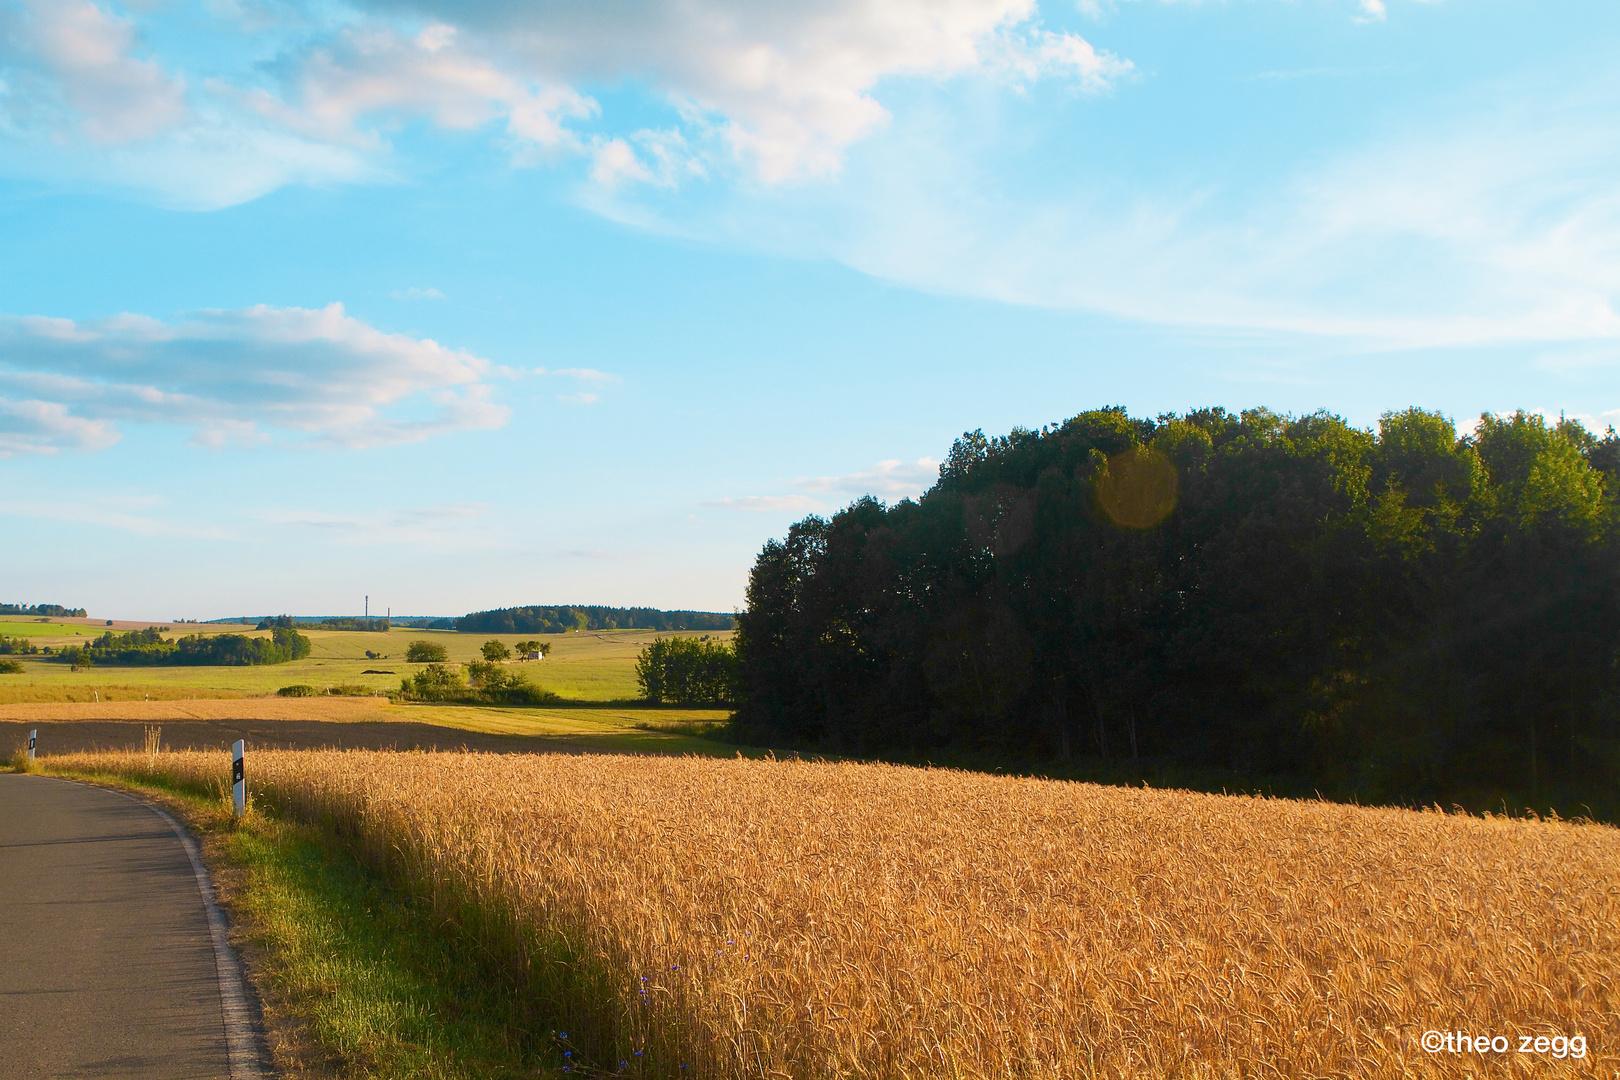 kornfeld bei schönbach-vogtland